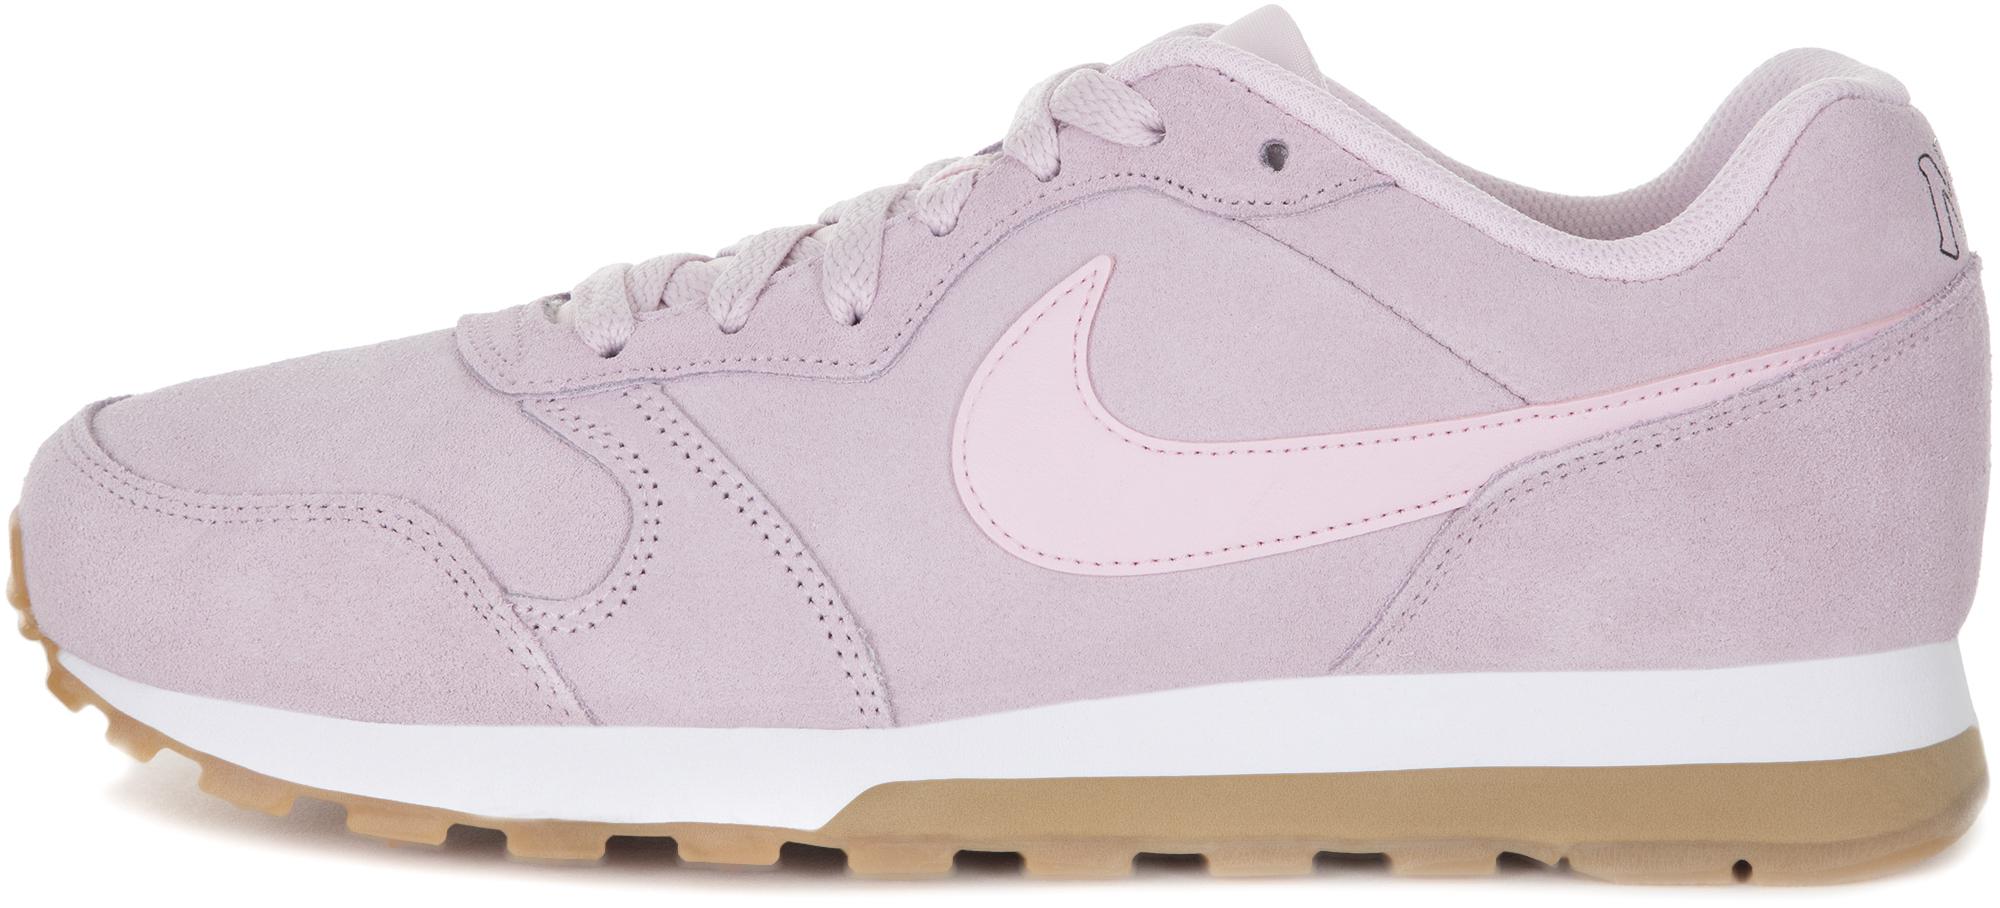 Nike Кроссовки женские Nike MD Runner 2 SE, размер 36,5